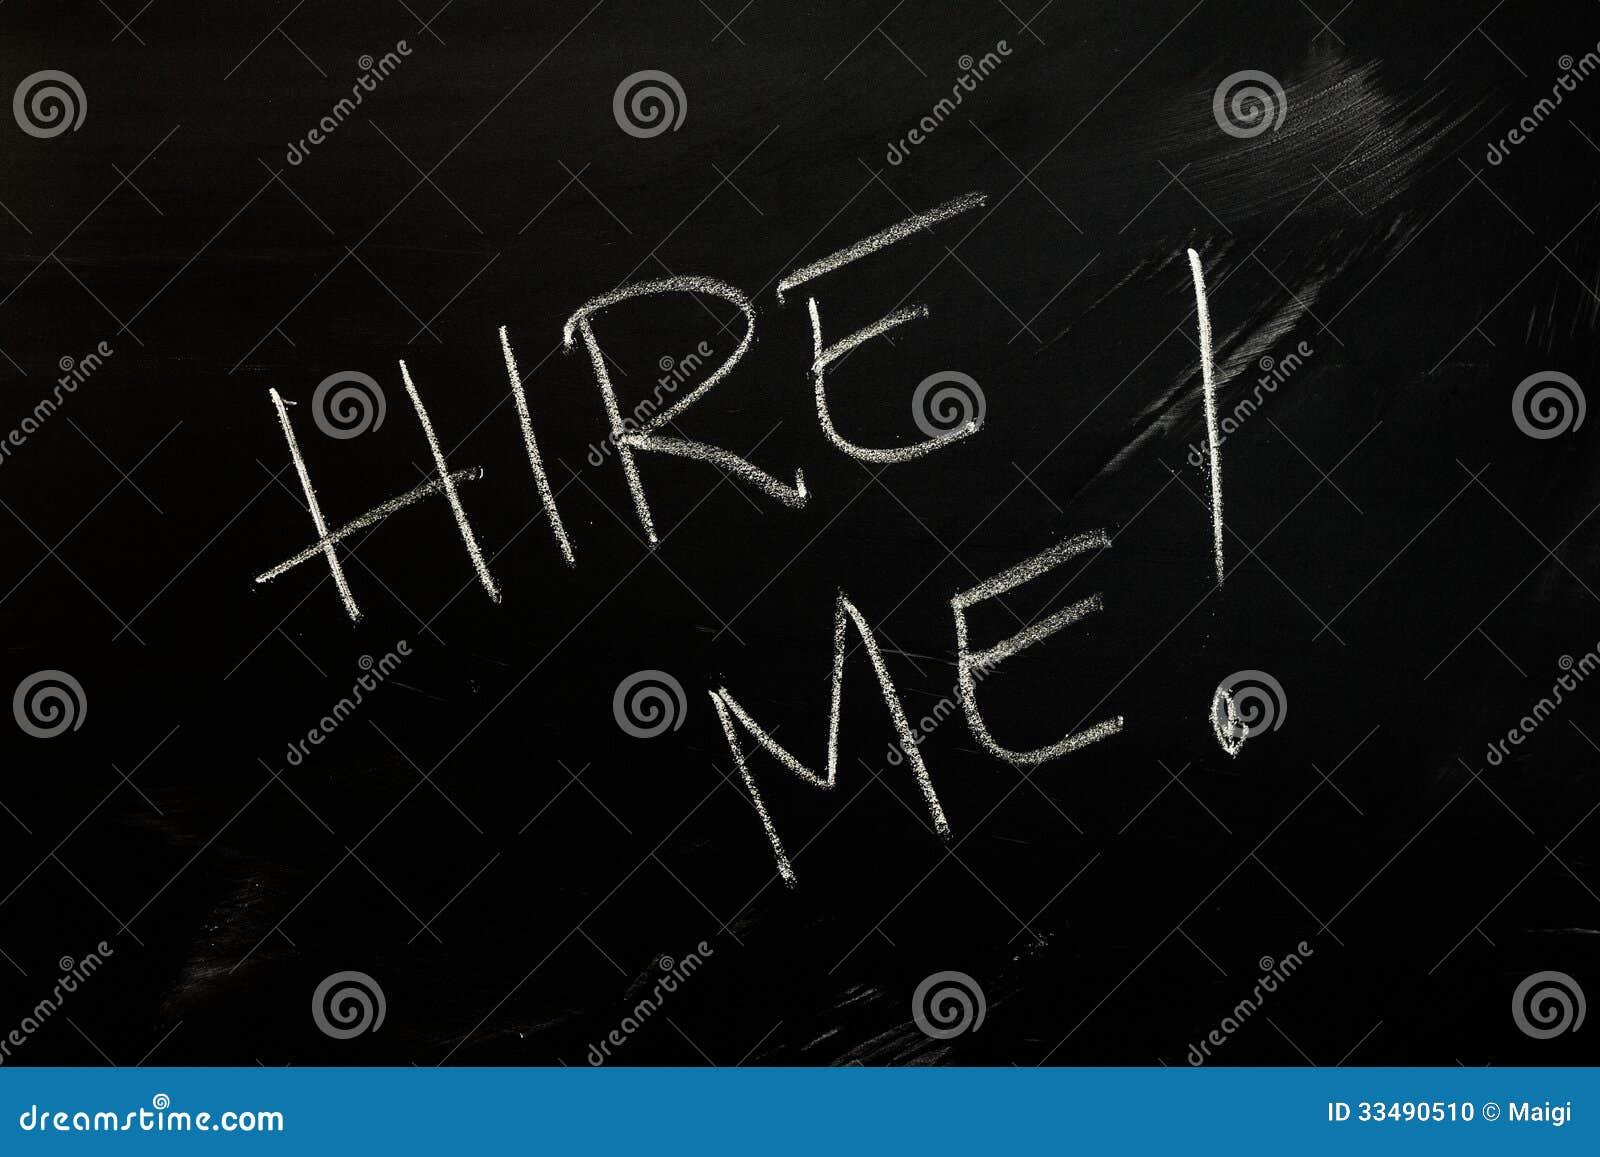 Download Hire Me stock photo. Image of challenge, alert, unemployment - 33490510